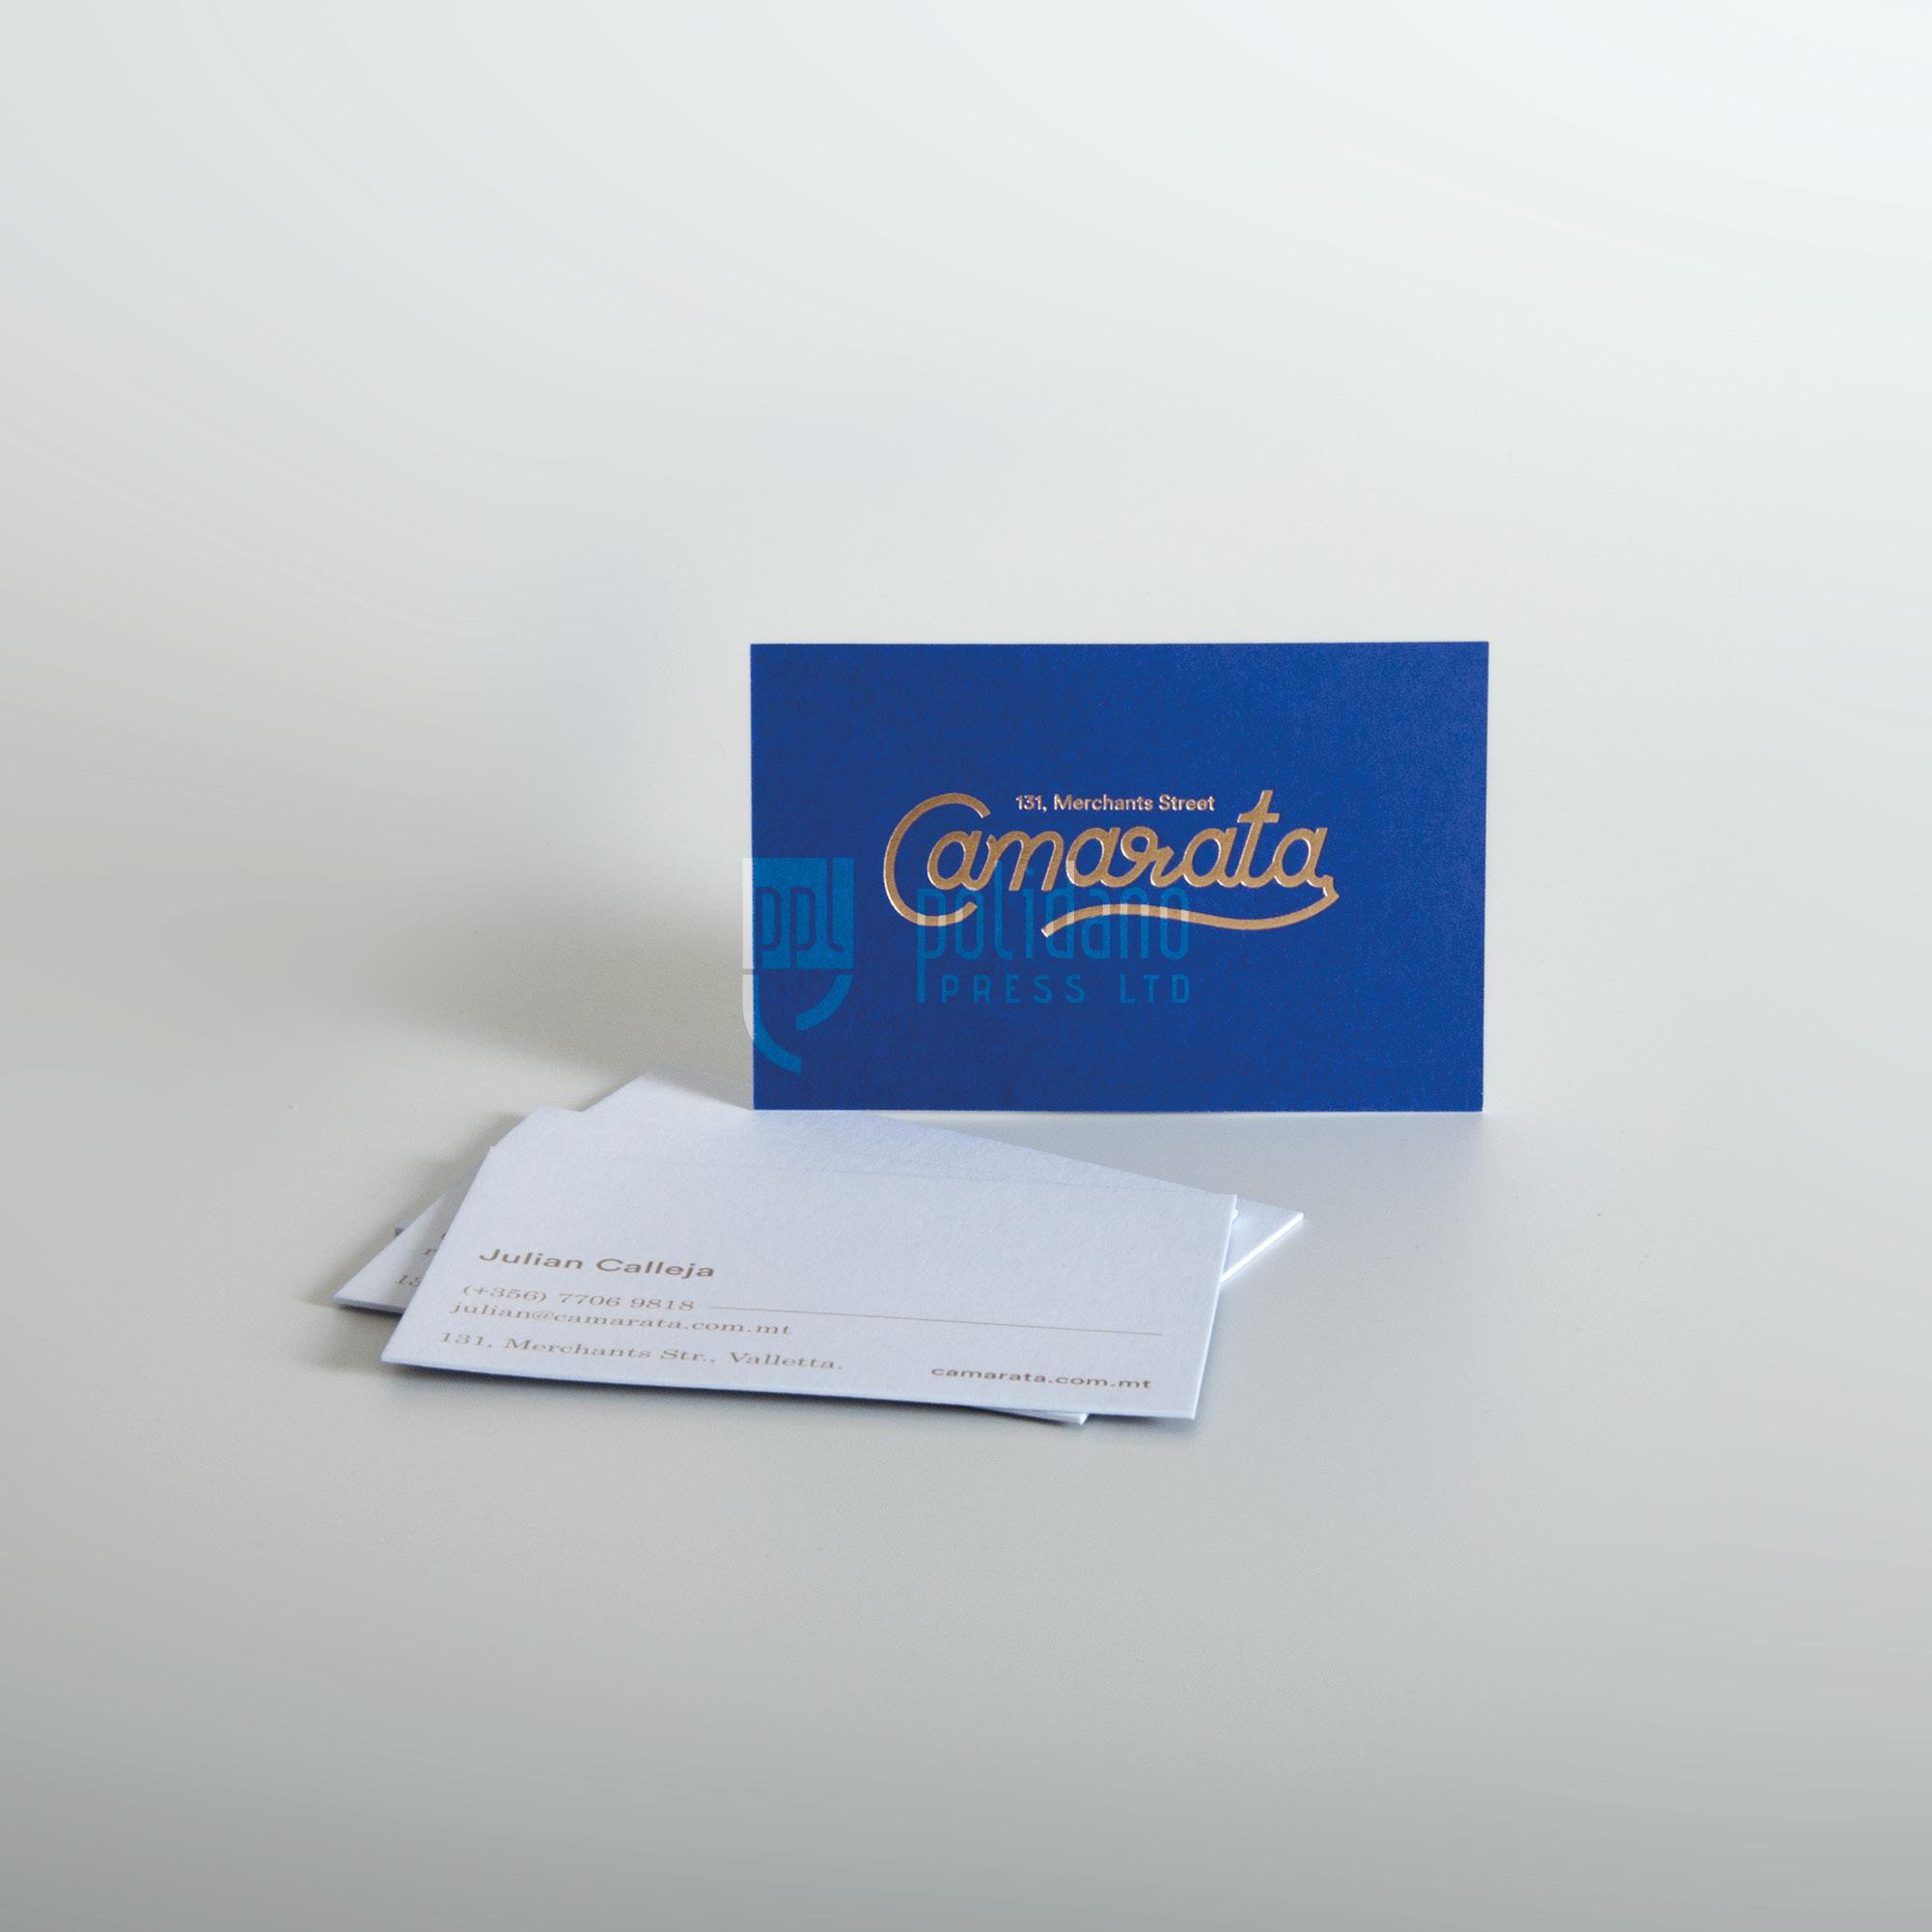 Camarata - 2 ply - gold foil